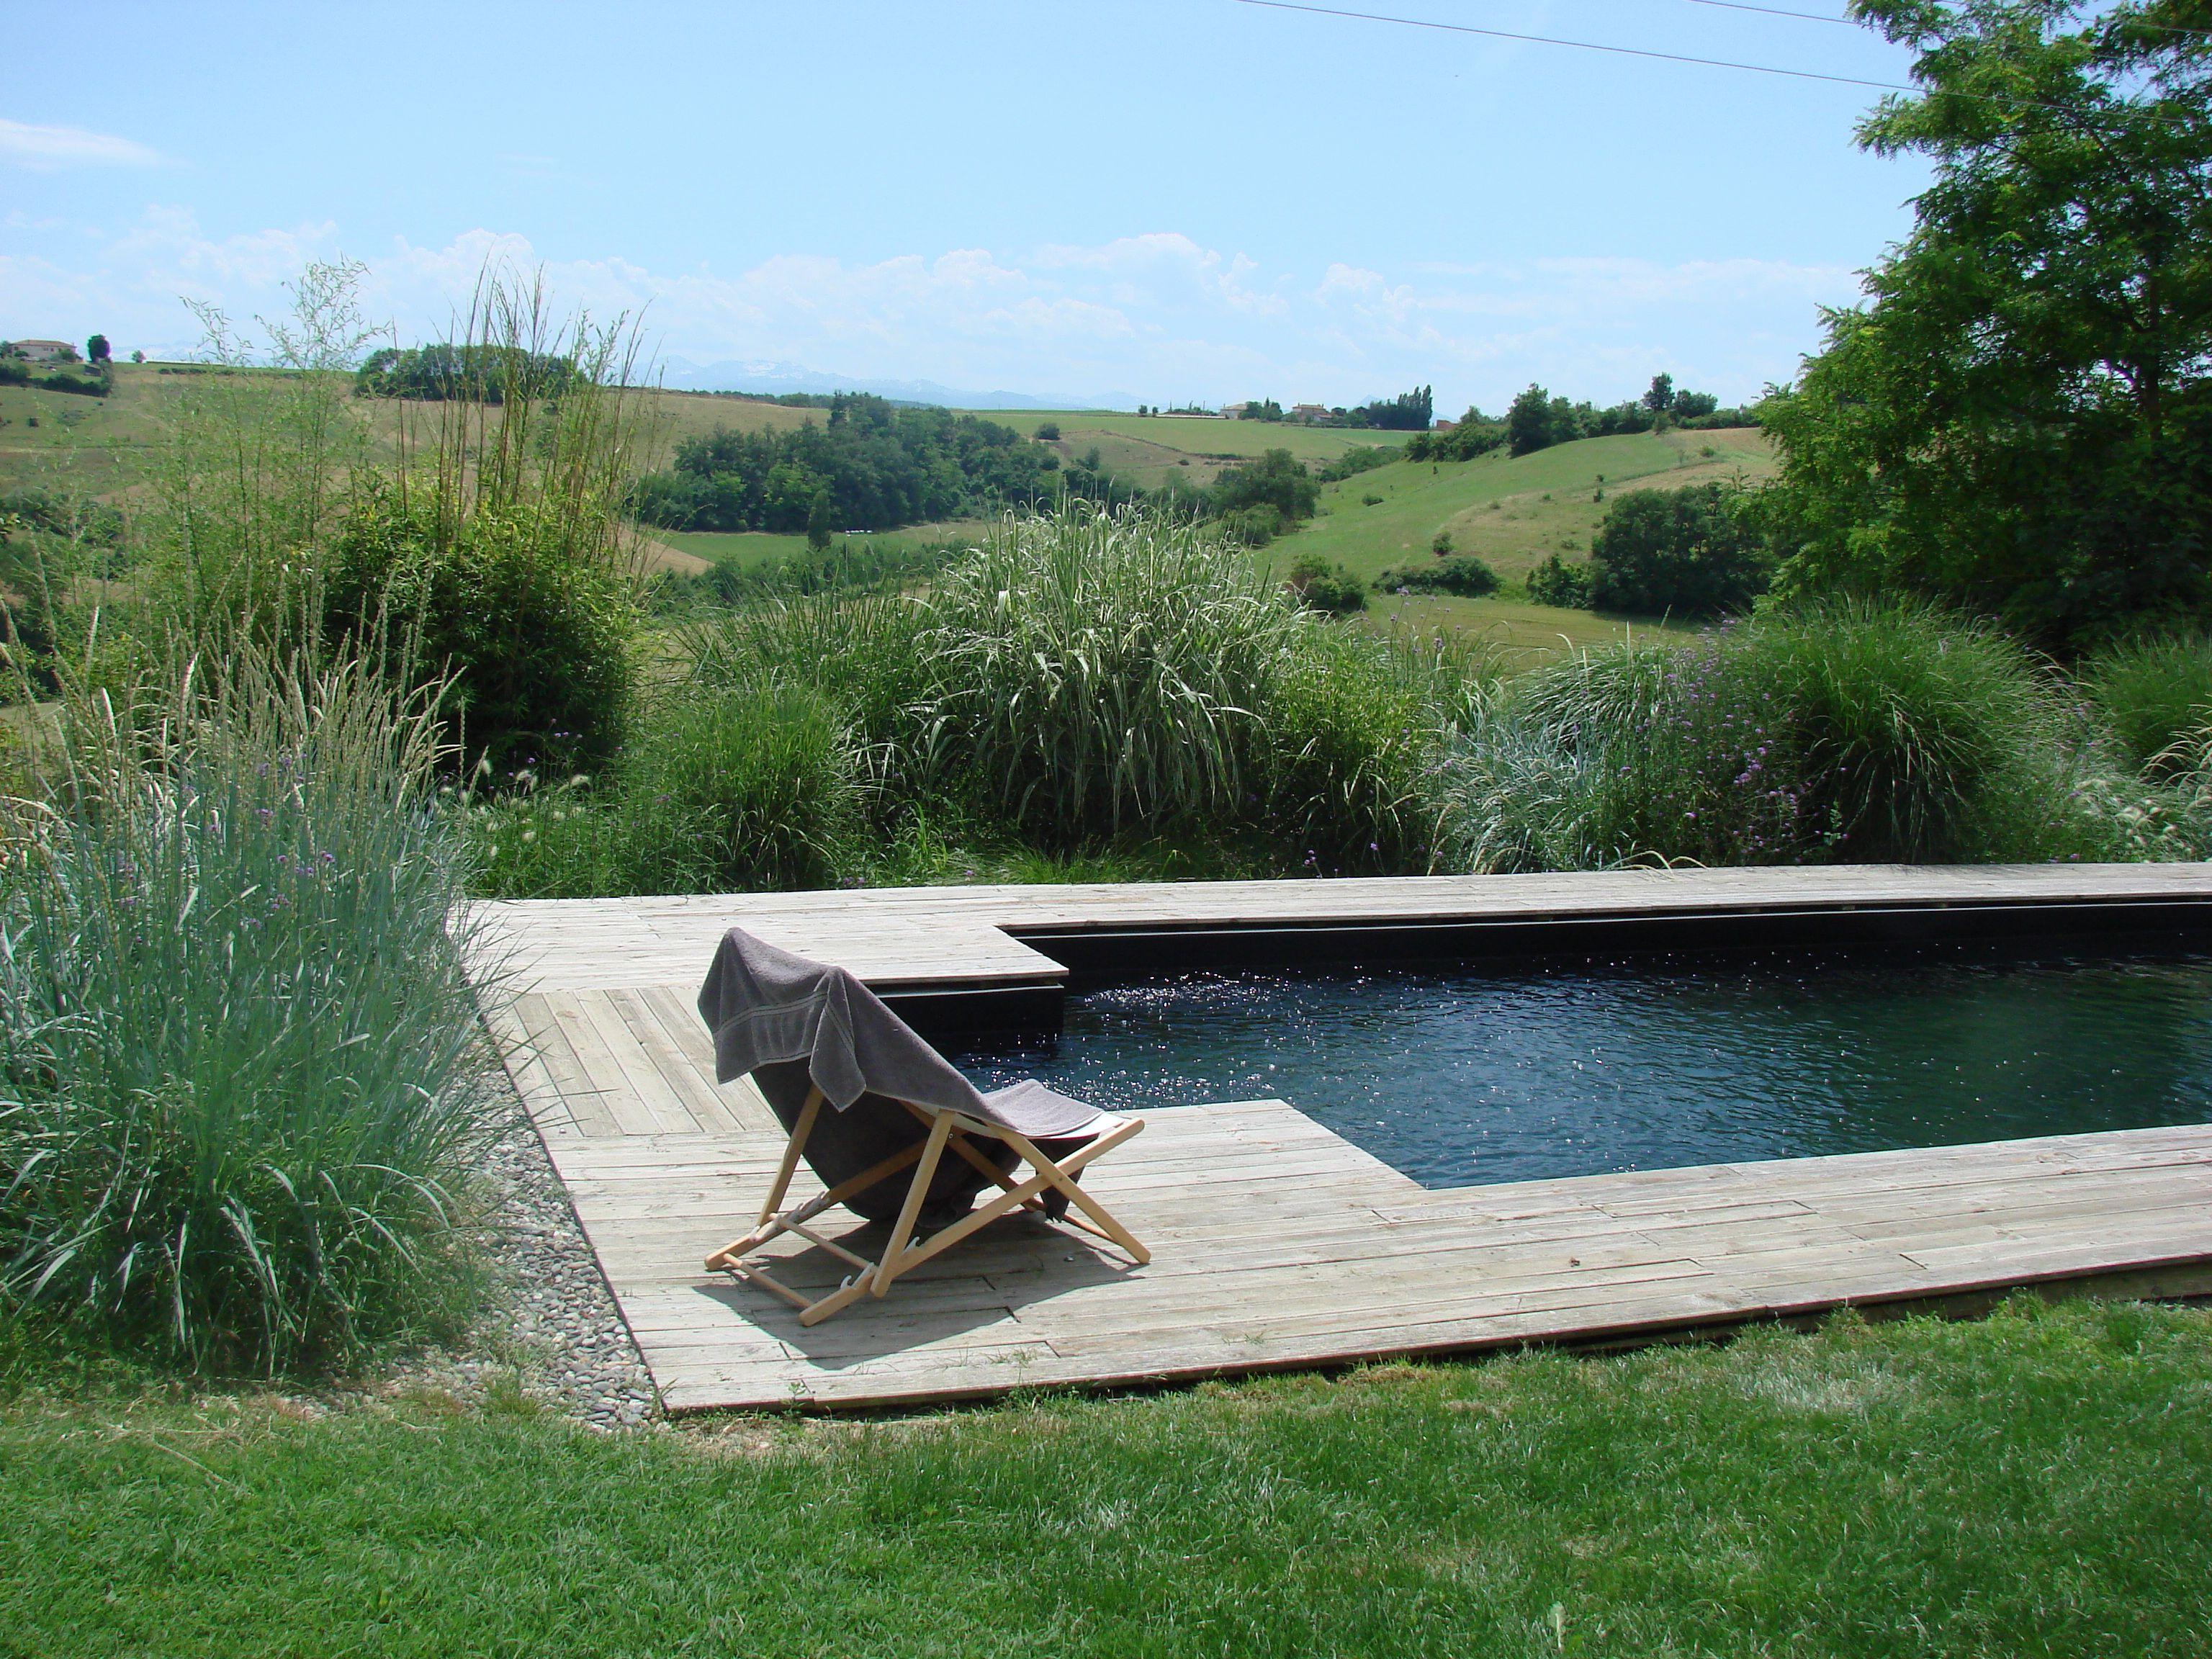 Pin by Mel B on La Ranchera | Swimming pool designs, Pool designs ...